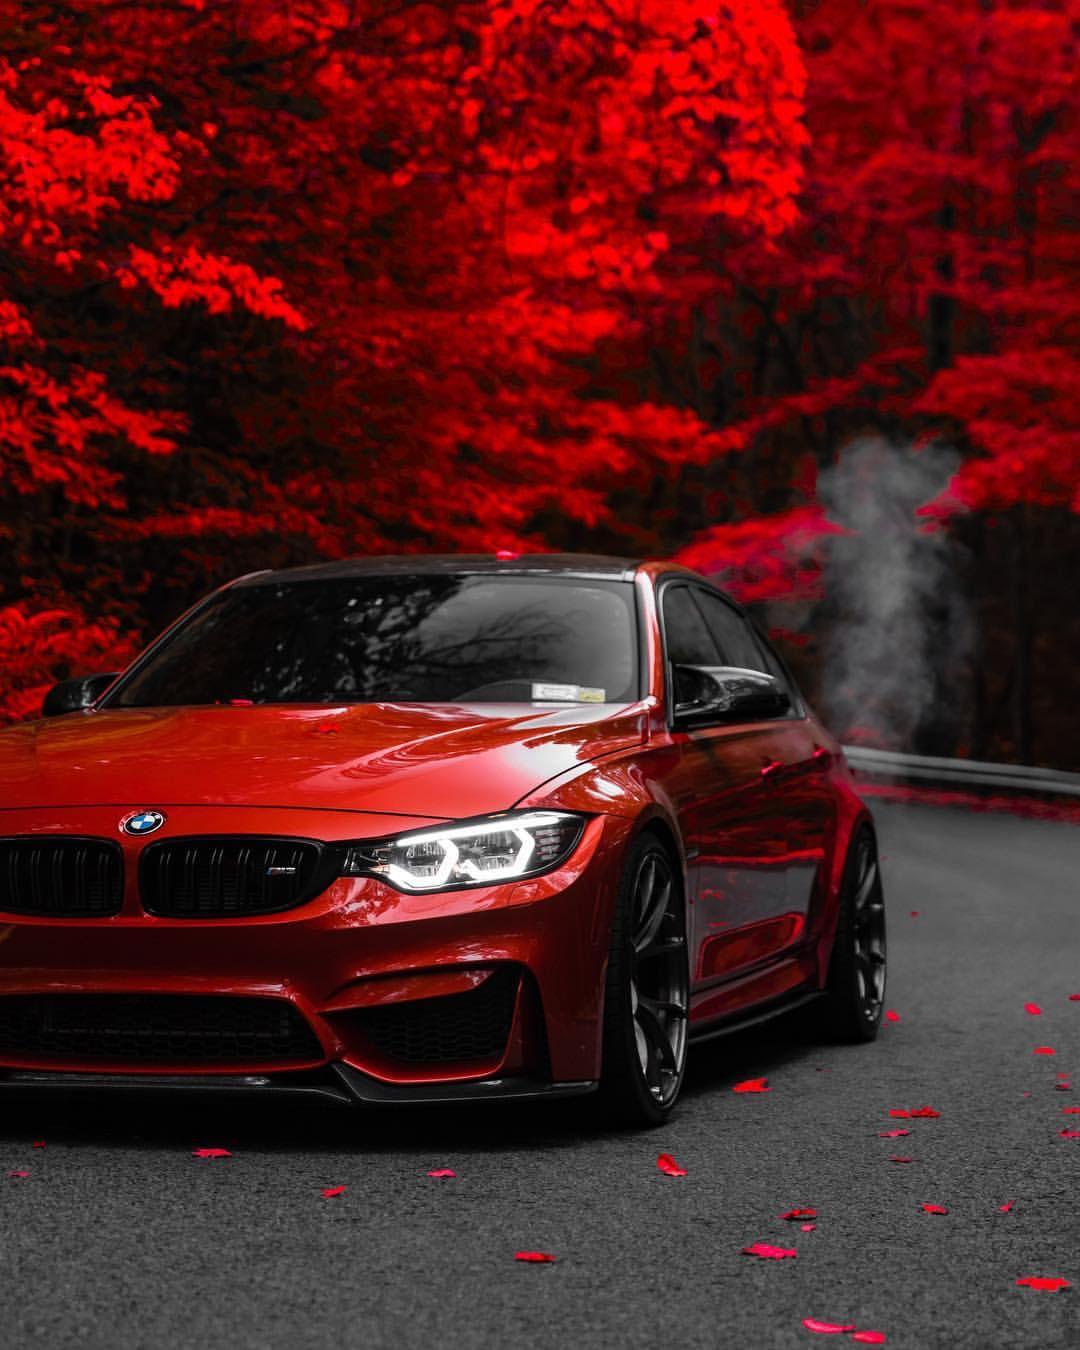 Pin By Omus On Beni Mutlu Eden Seyler Bmw Red Bmw Dream Cars Bmw